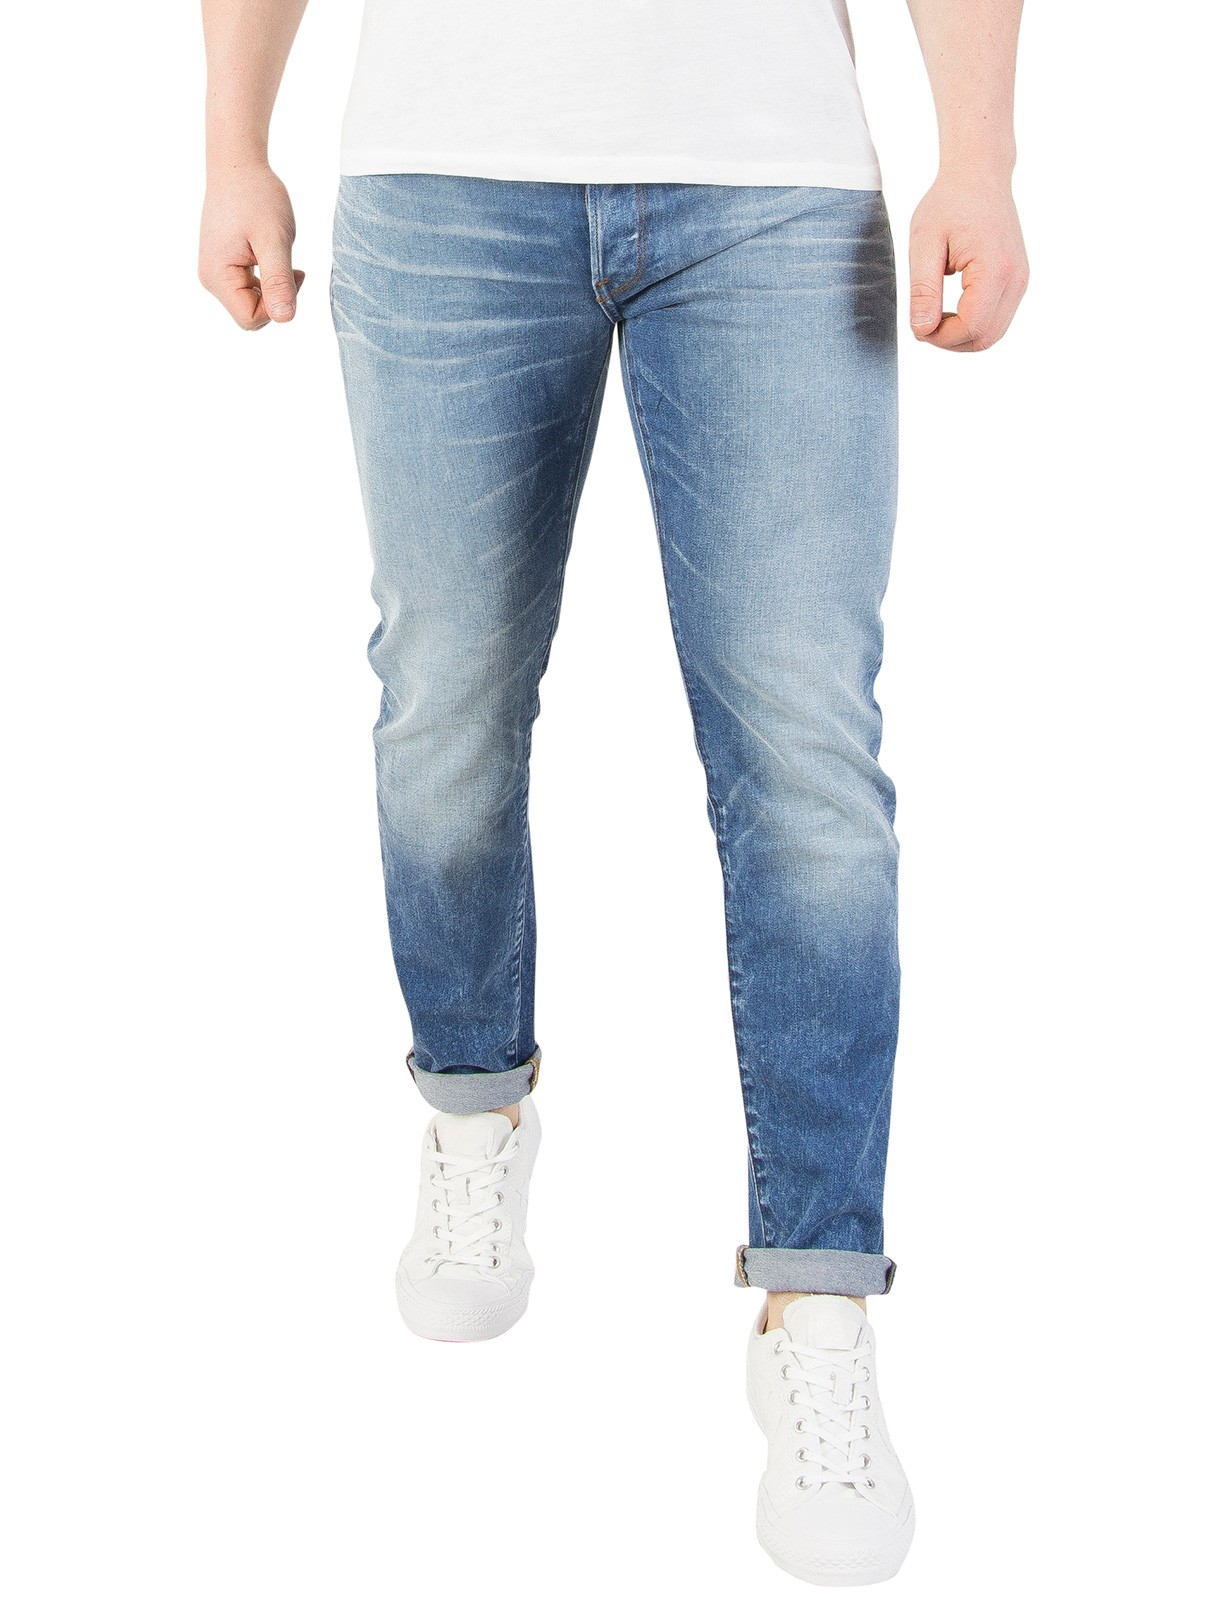 fb32f8c7 G-Star Light Aged 3301 Slim Jeans